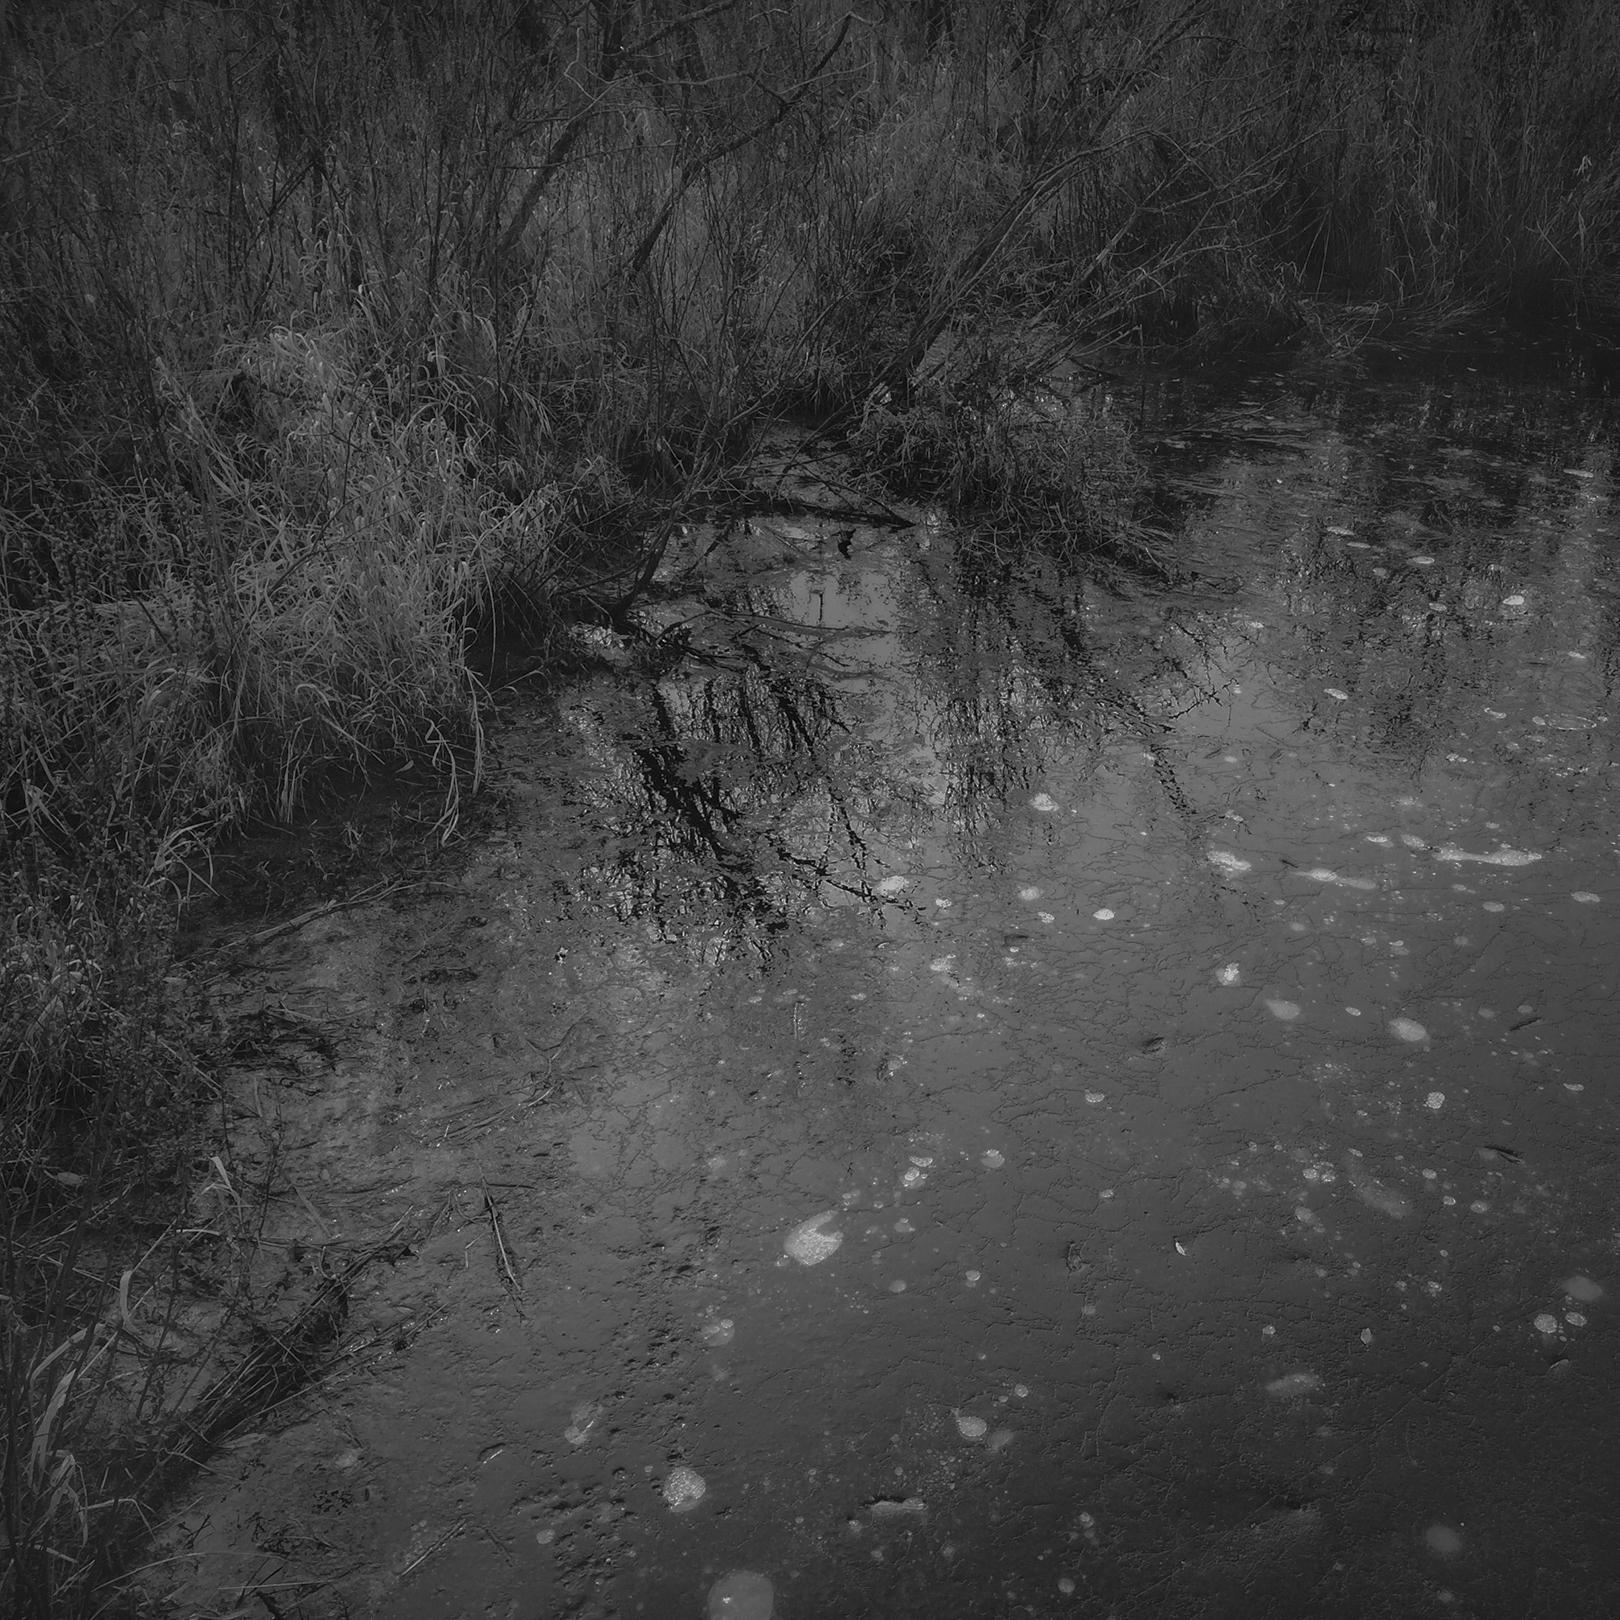 ice_reflection_web.jpg